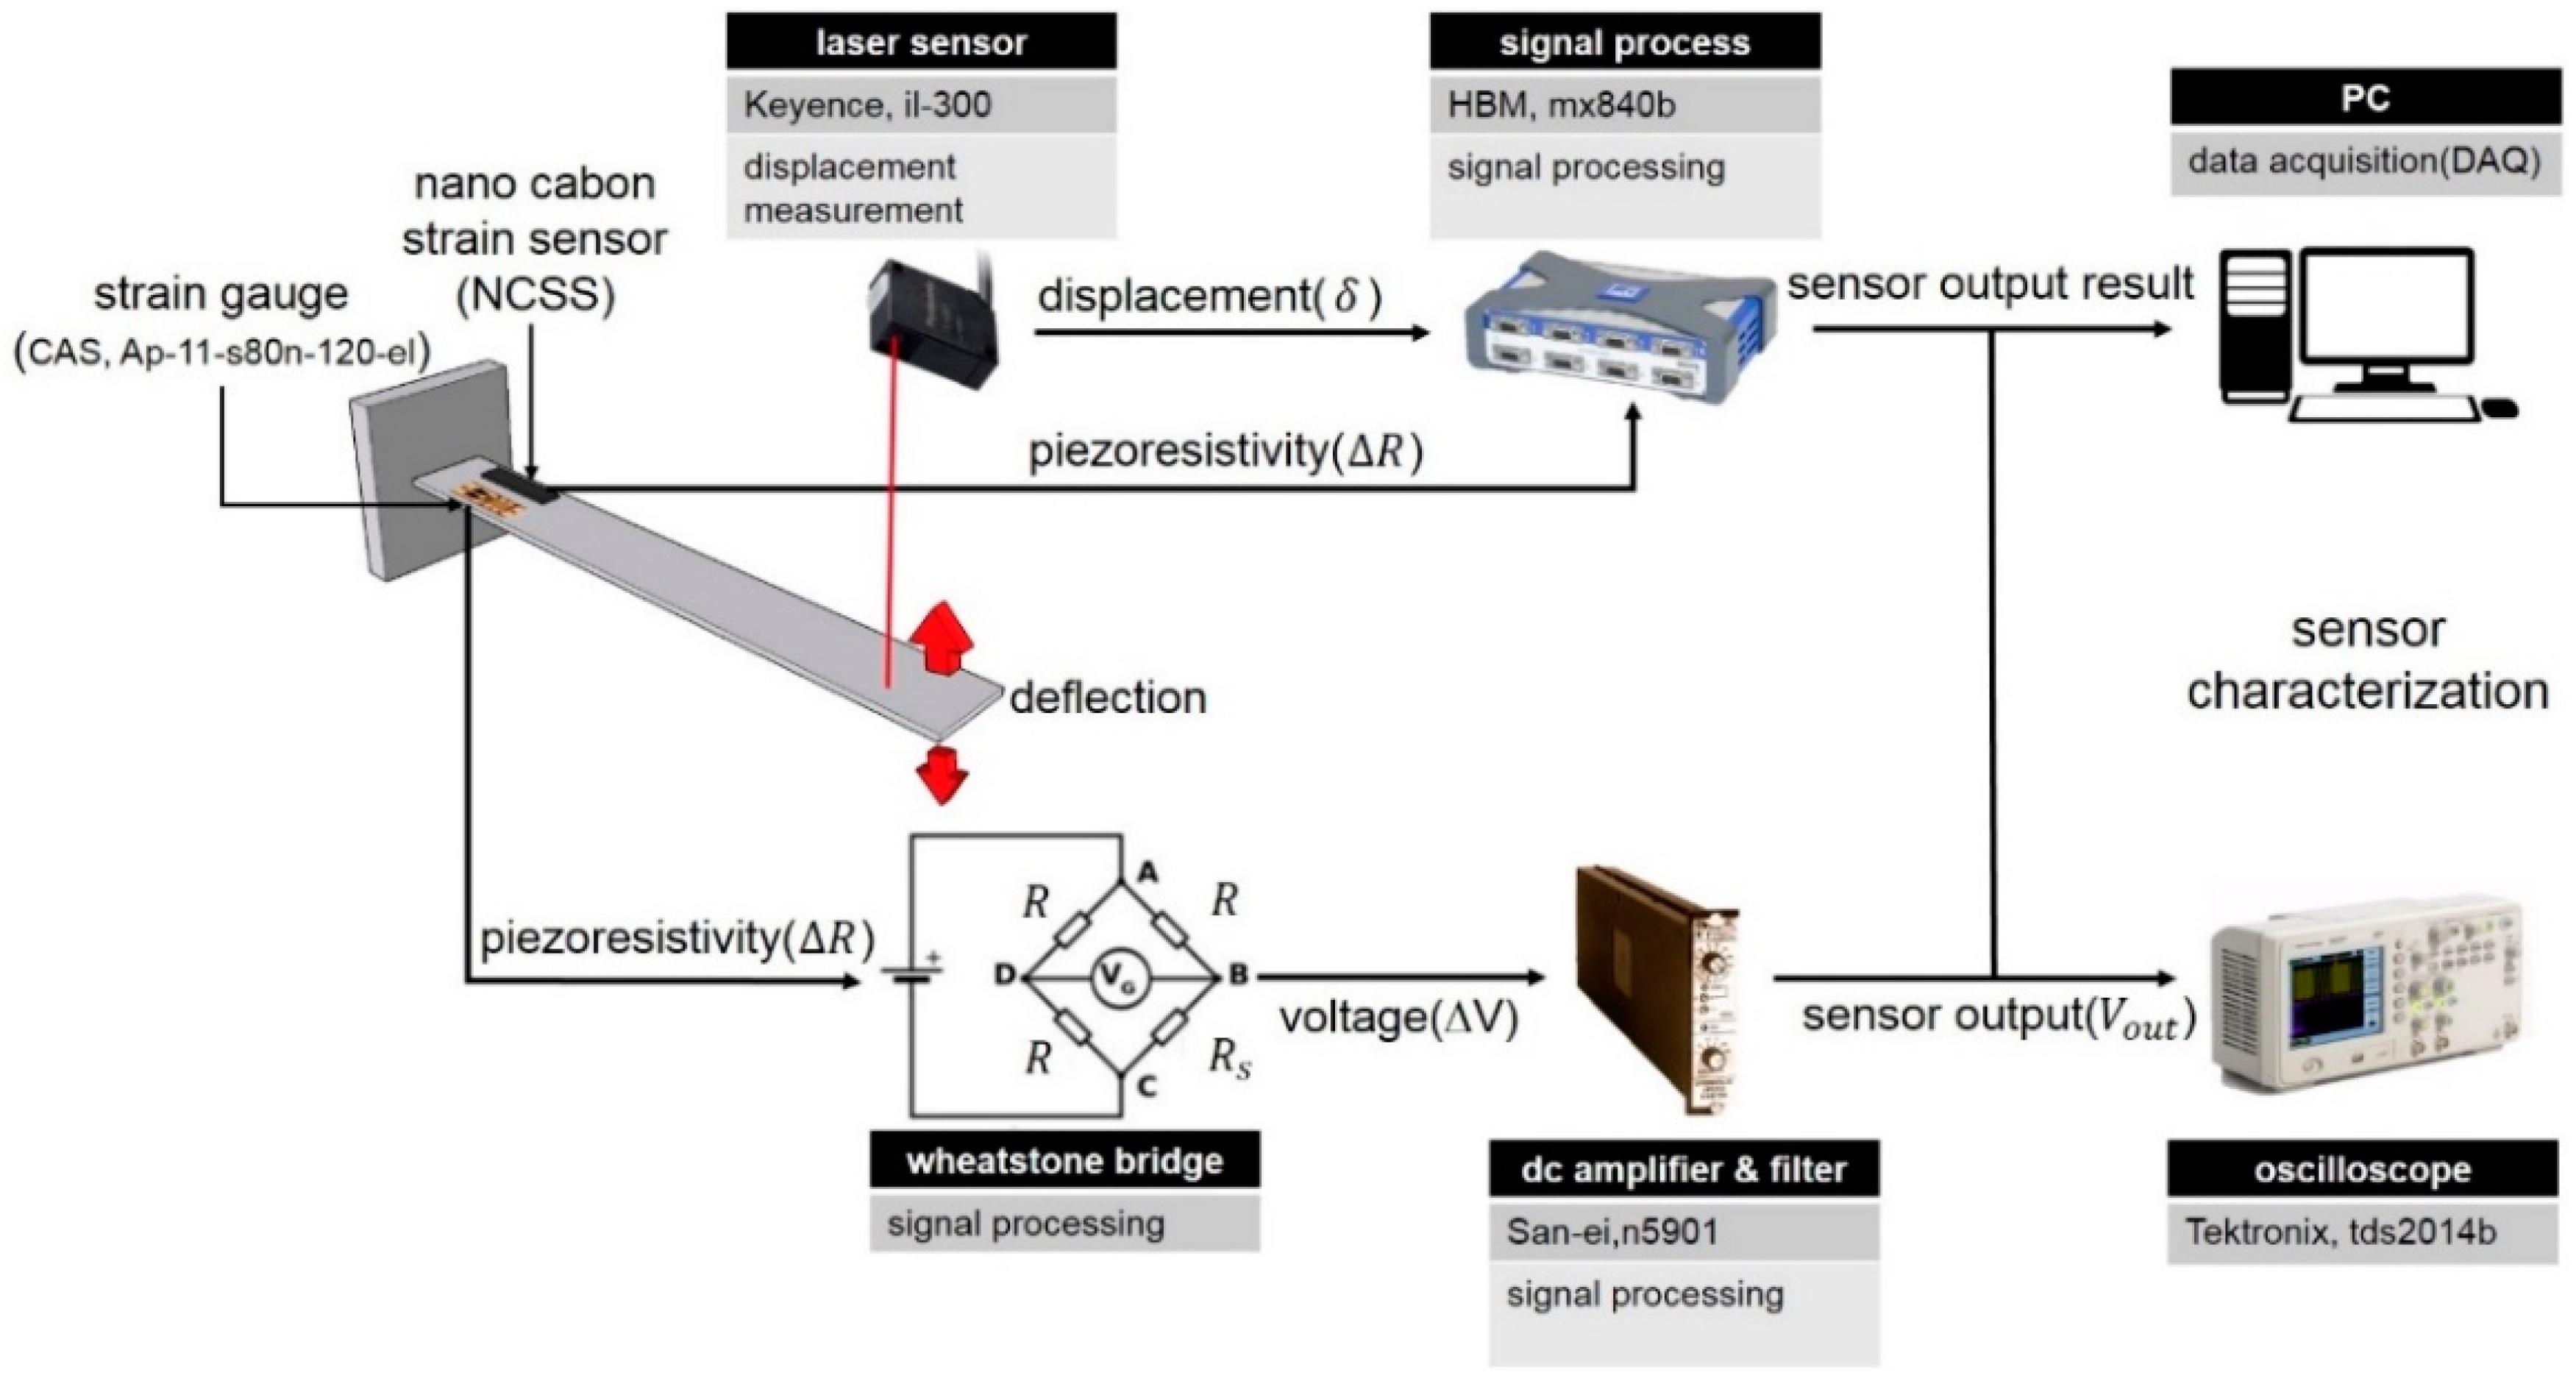 Keyence Il 1000 Wiring Diagram Sensors Free Full Text A Spray On Carbon Nanotube Artificial